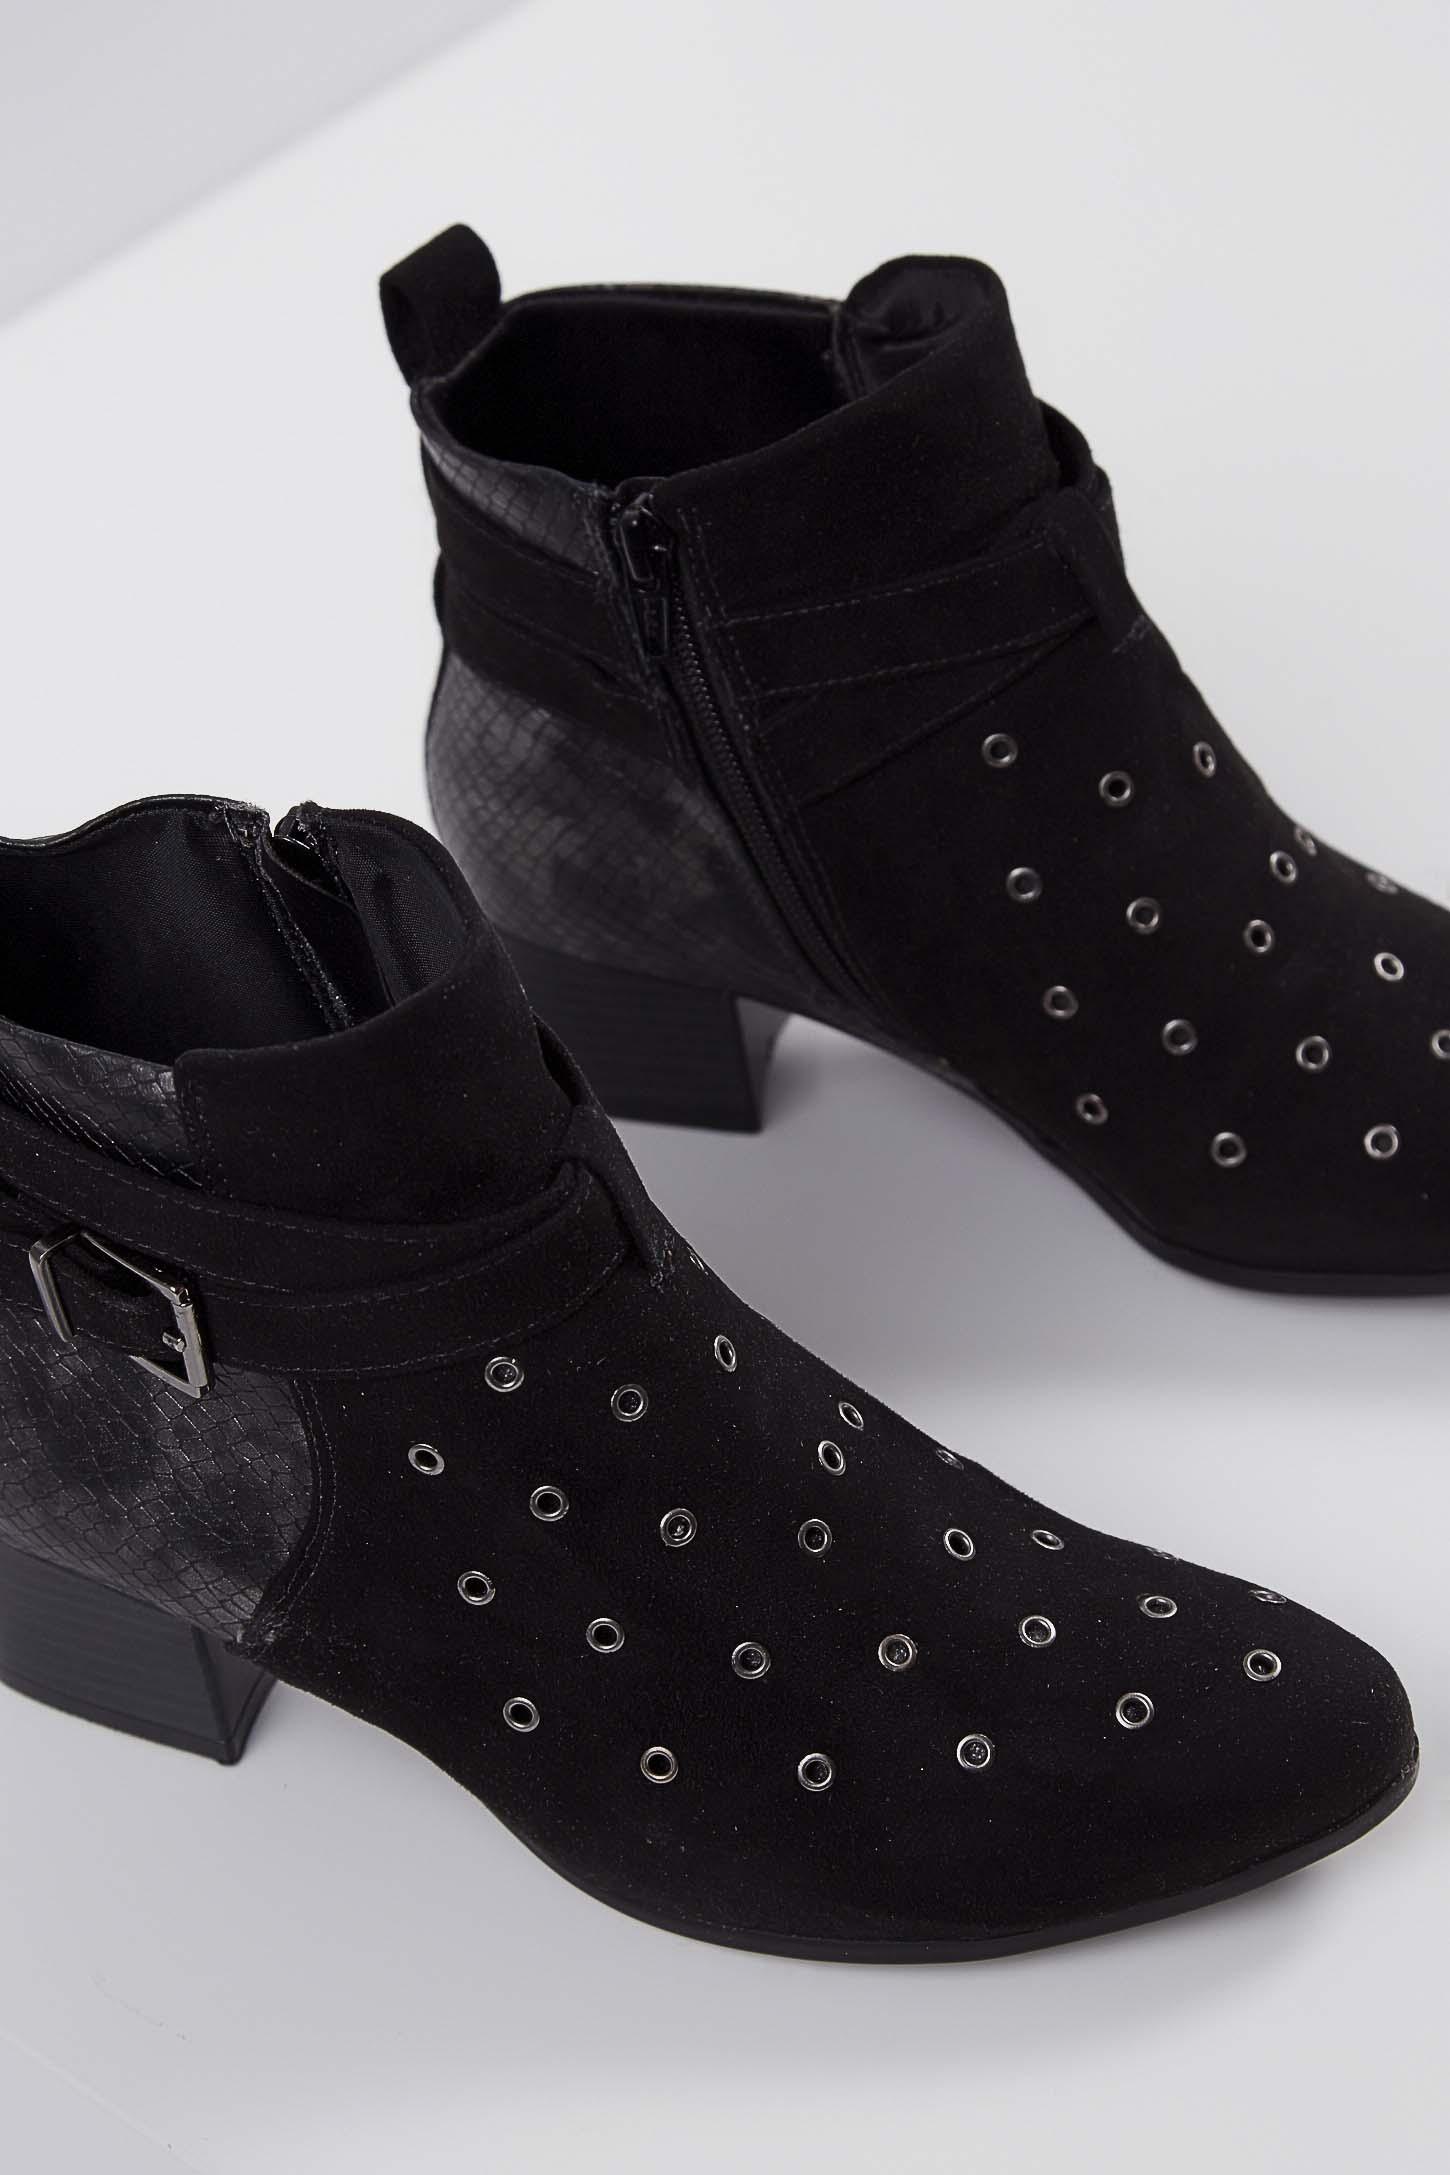 Bota-Feminina-Ankle-Boot-Ramarim-Preto-